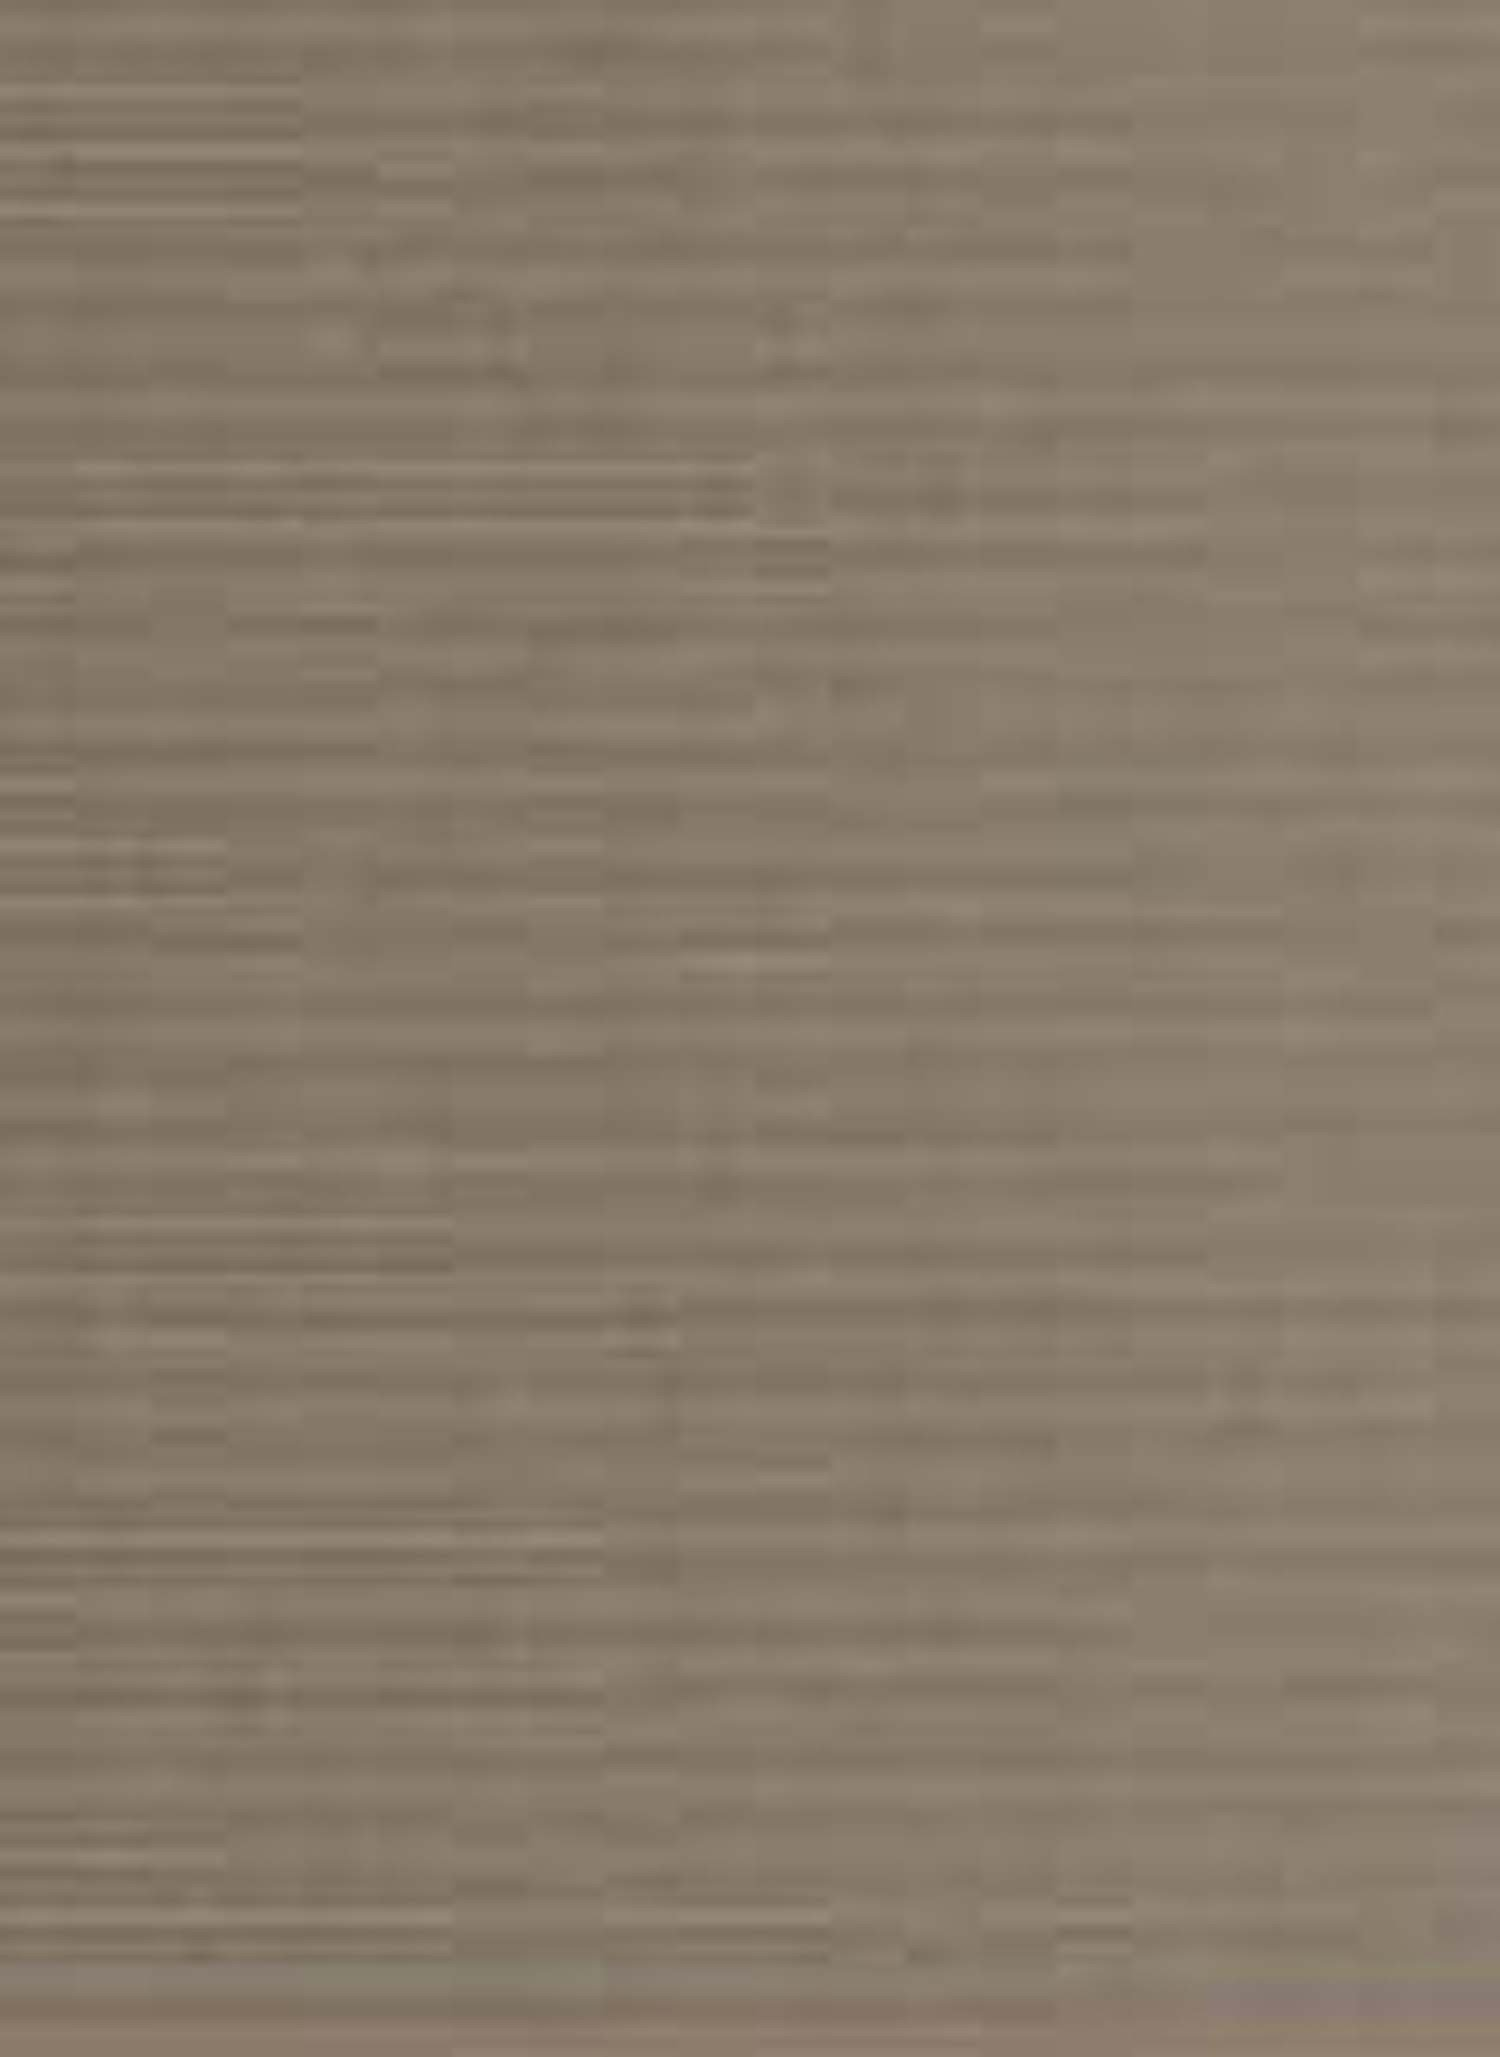 Easyfix Doppelr.mocca 45x150cm - 2 - Ronja.ch